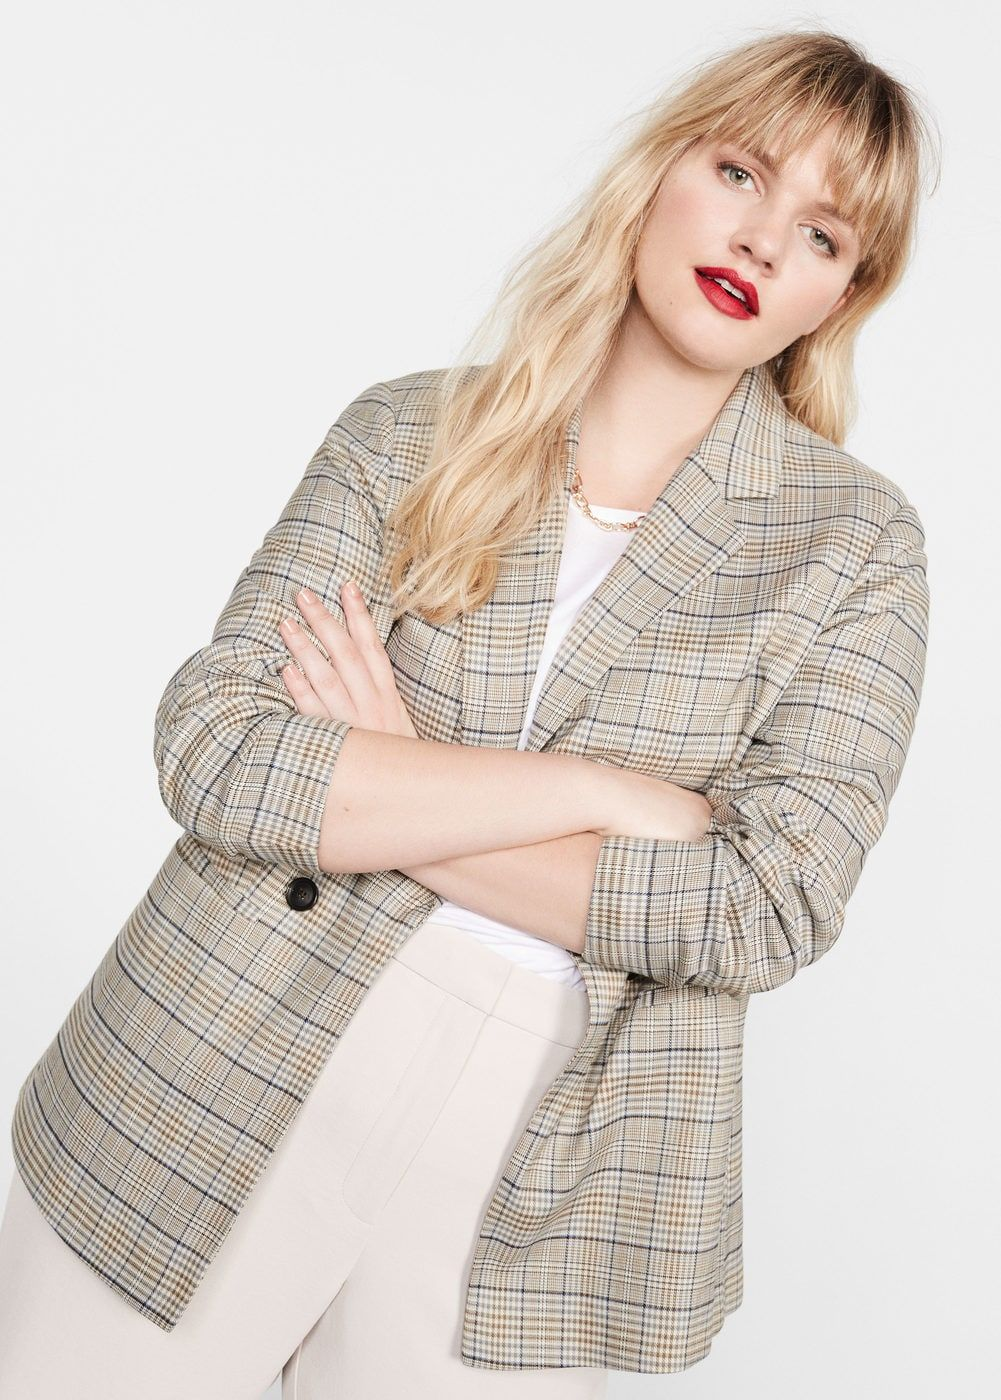 Gigi Hadid Chose the Same Trendy Basic for Jury Duty and Date Night, Wustoo